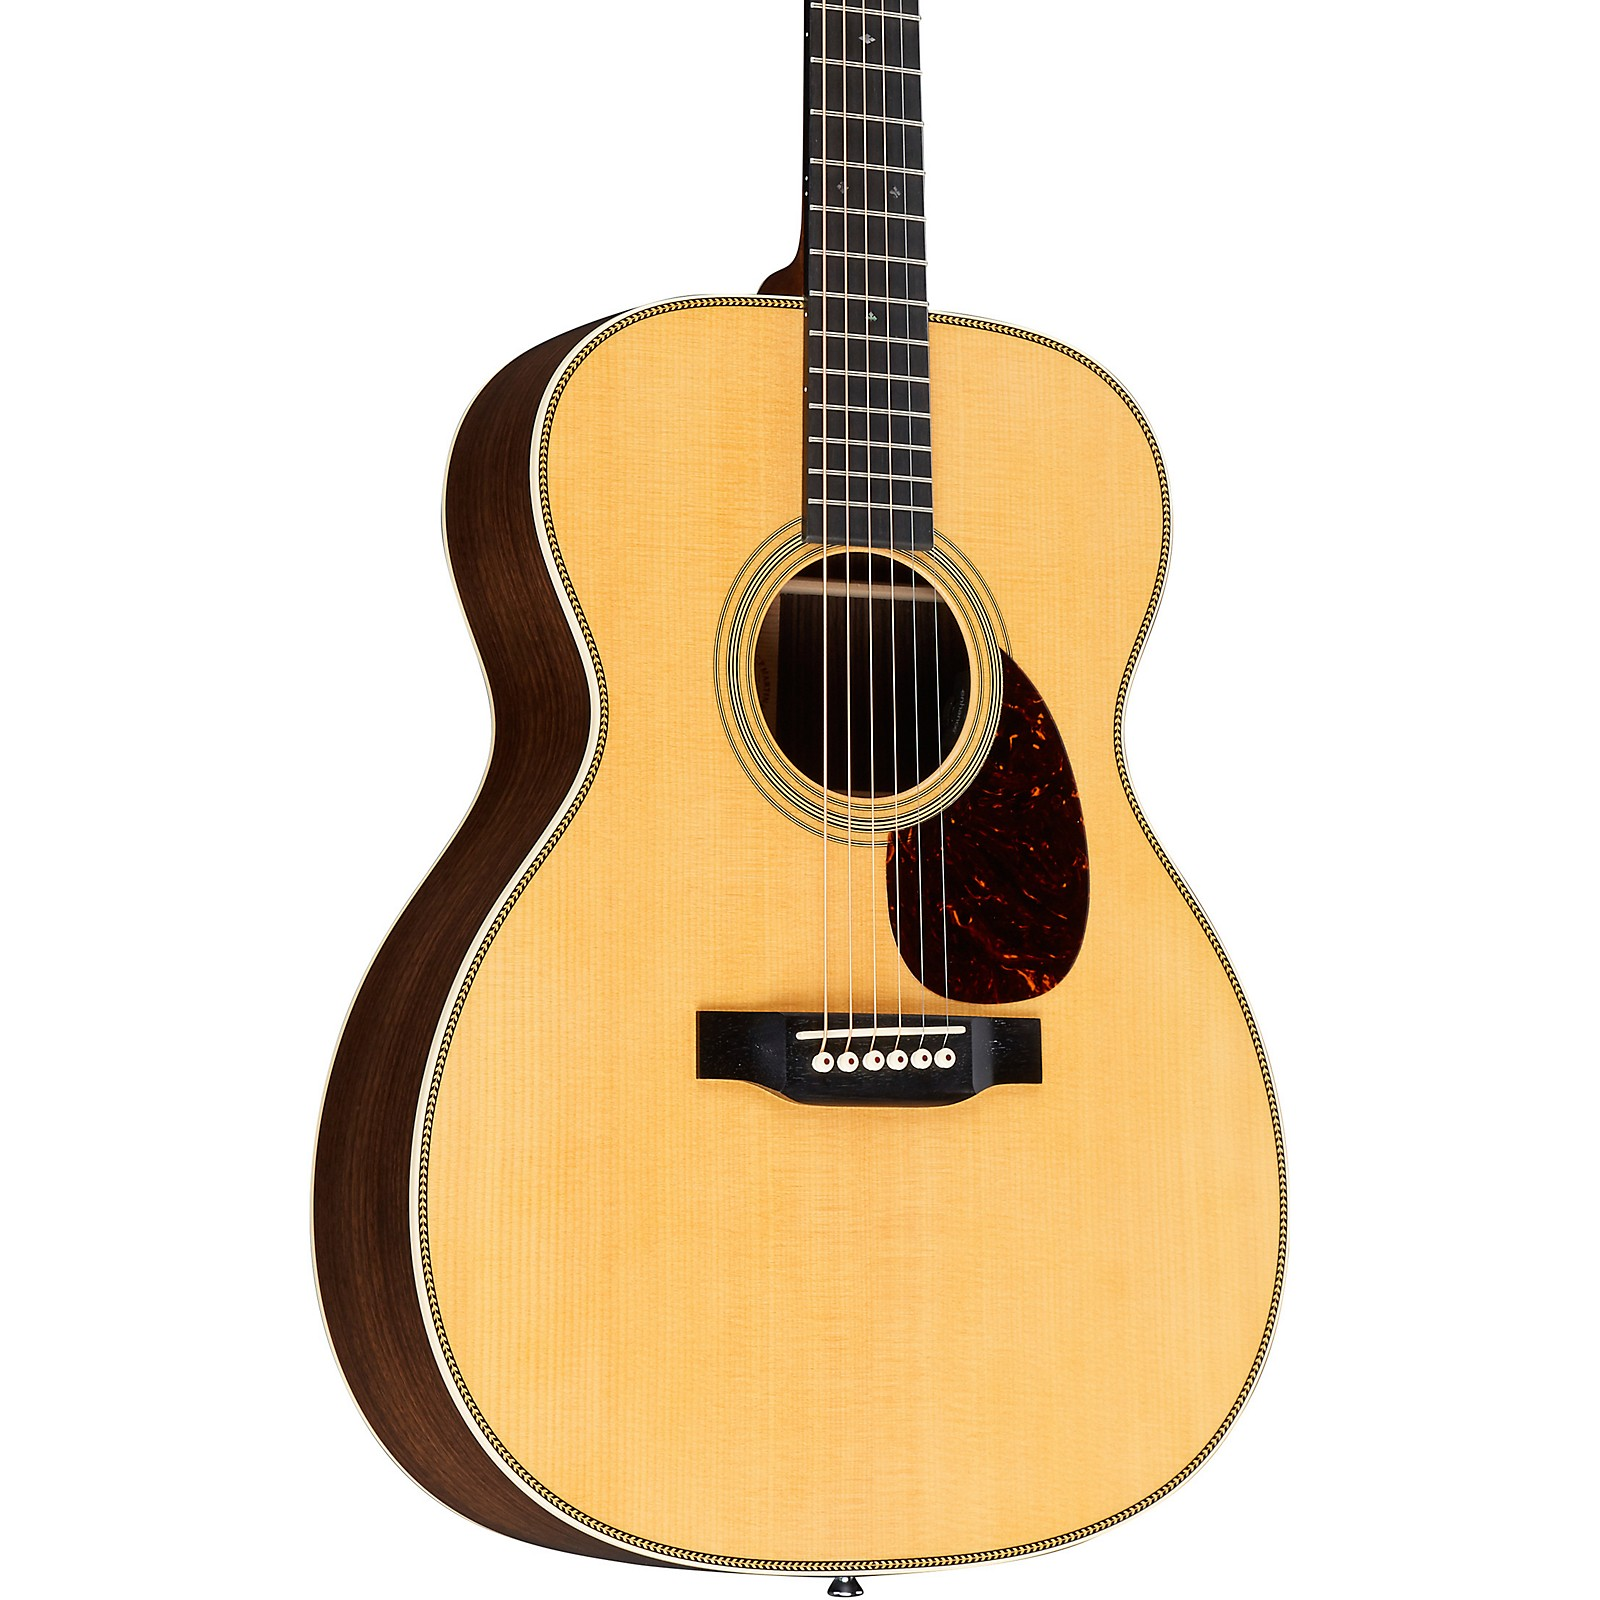 Martin OM-28E Standard Orchestra Model Acoustic-Electric Guitar